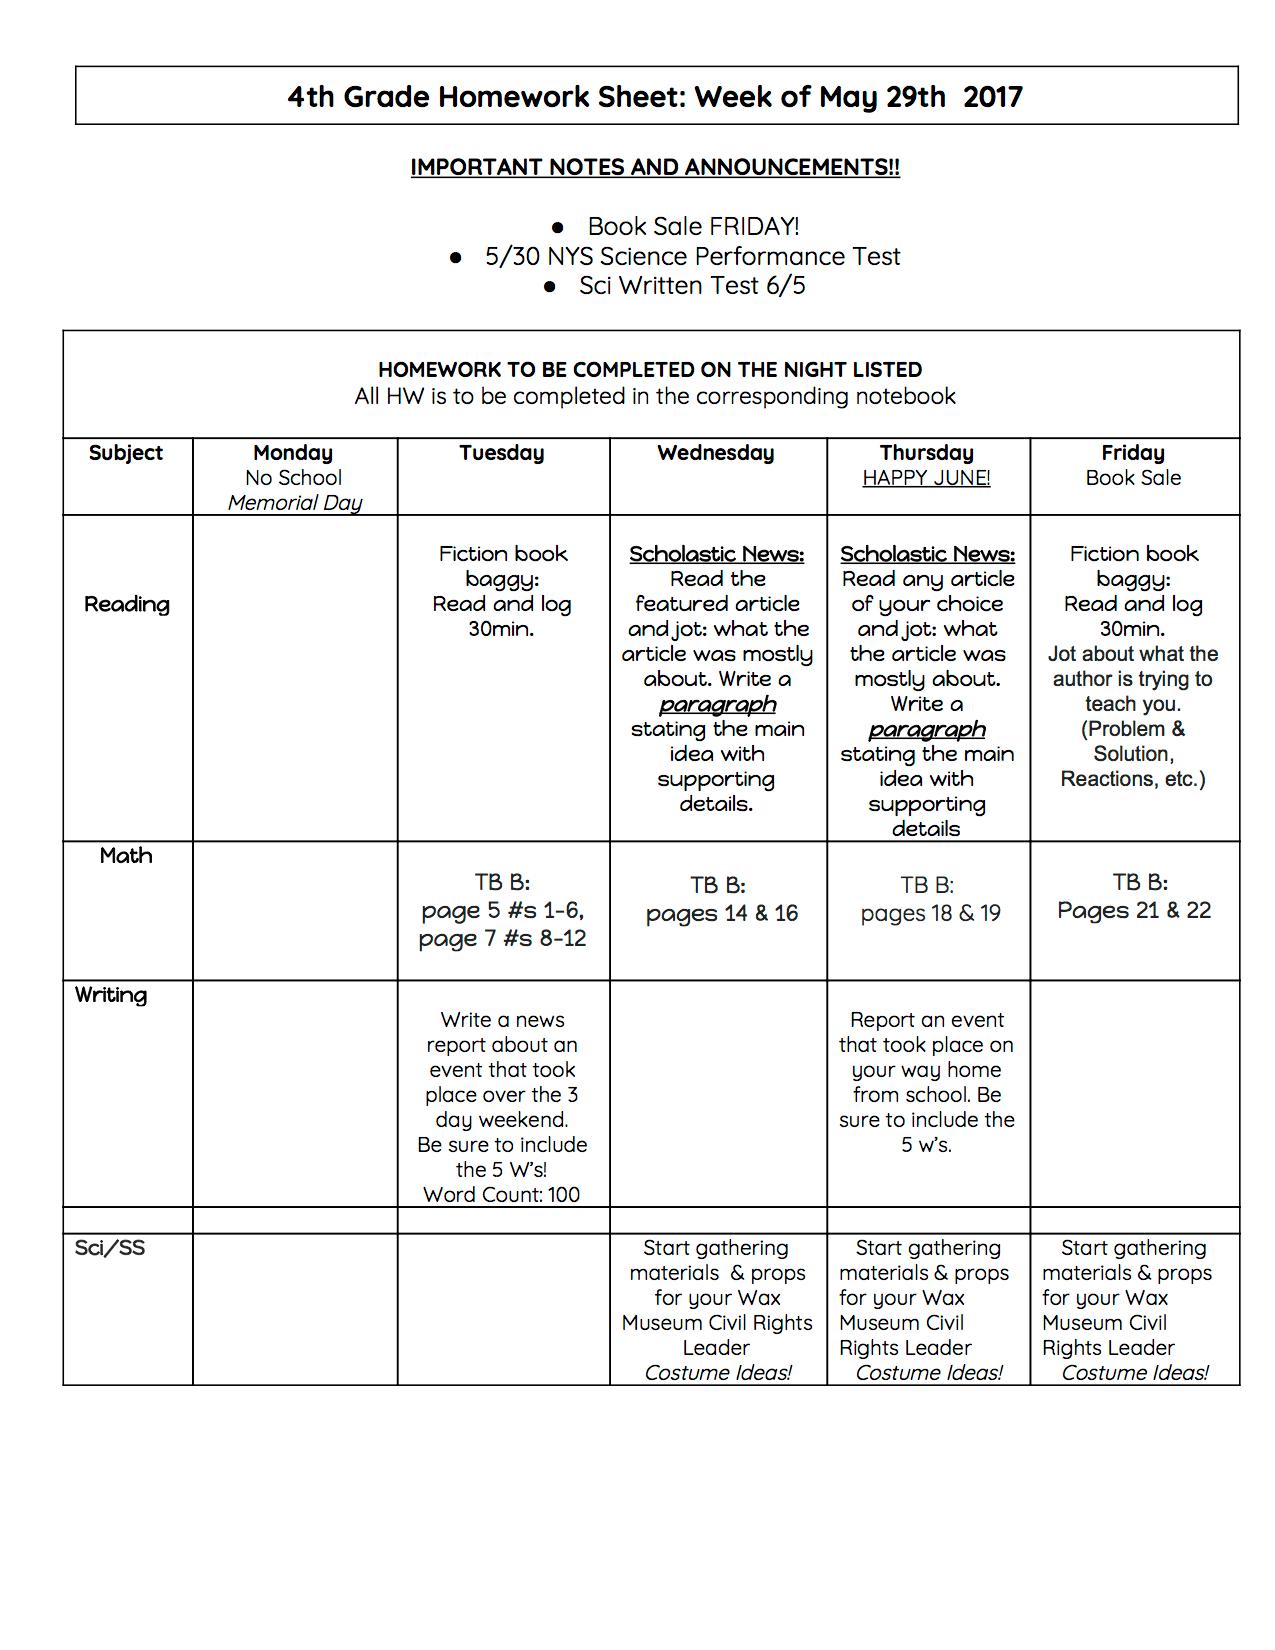 4th Grade Homework For Week Of 5 29 17 Taots